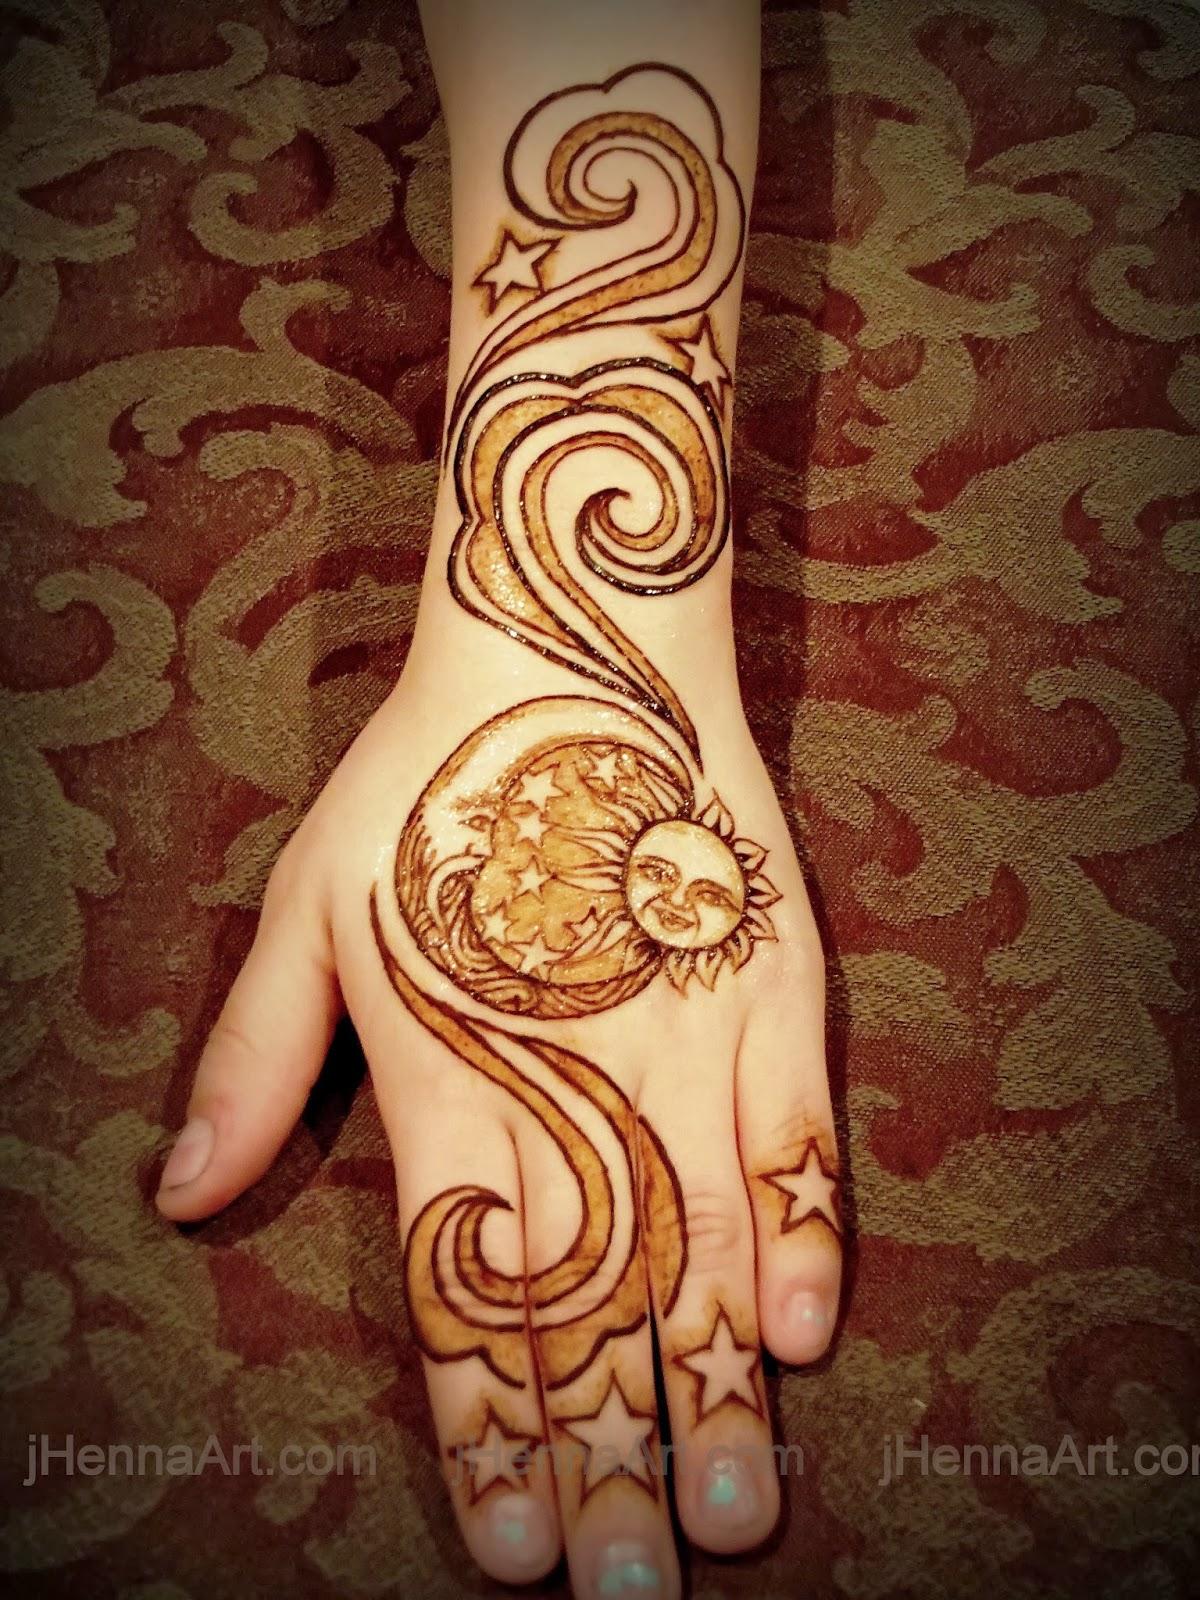 20140225 jen j Henna henna grand rapids lansing kalamazoo mi moon sun    Sun And Moon Henna Designs